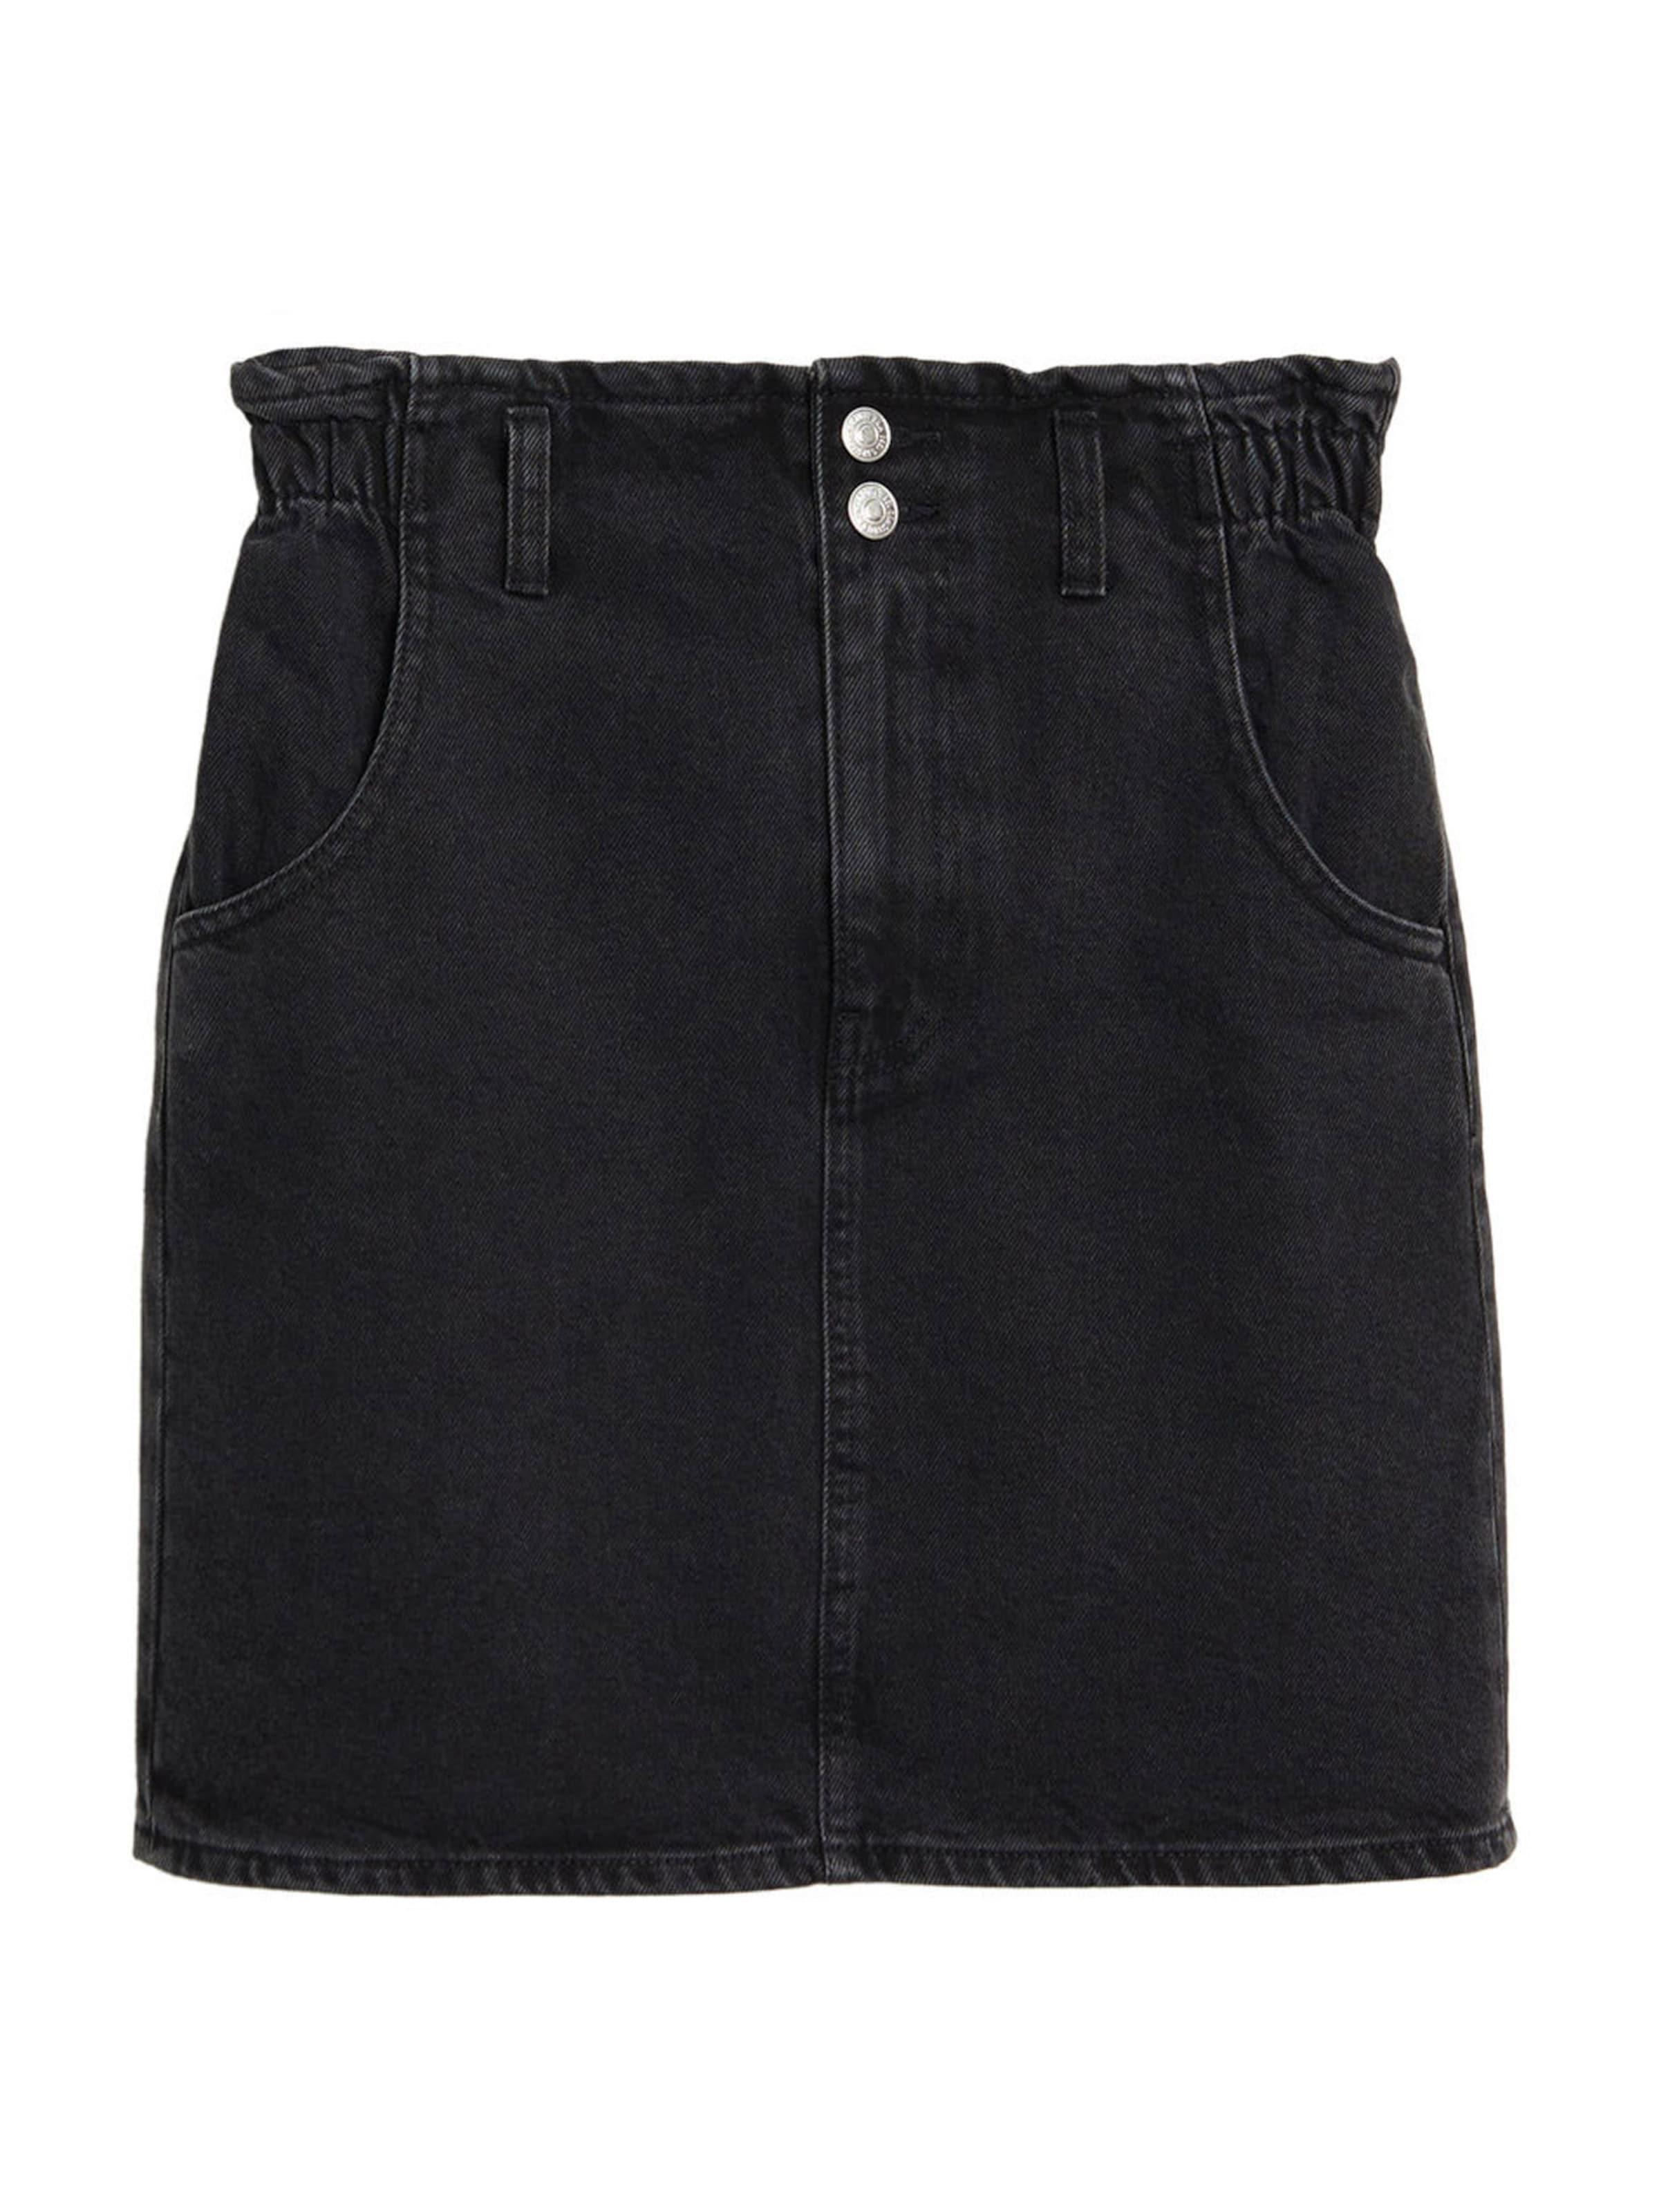 MANGO Rock 'Paperbag' in schwarz